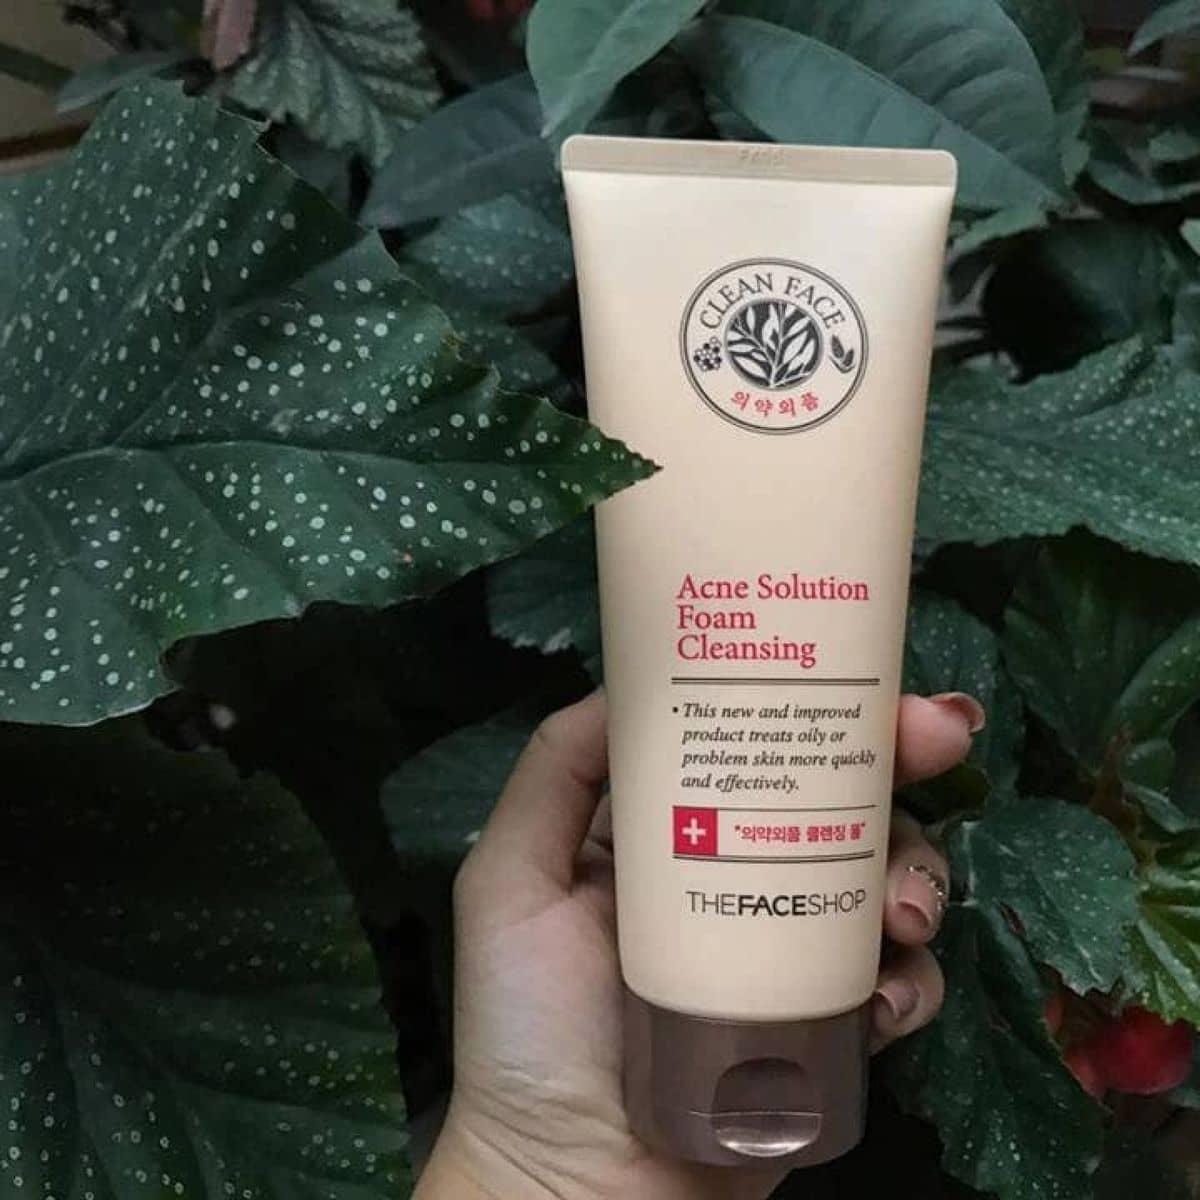 Kết quả hình ảnh cho Acne Solution Foam Cleansing The Face Shop